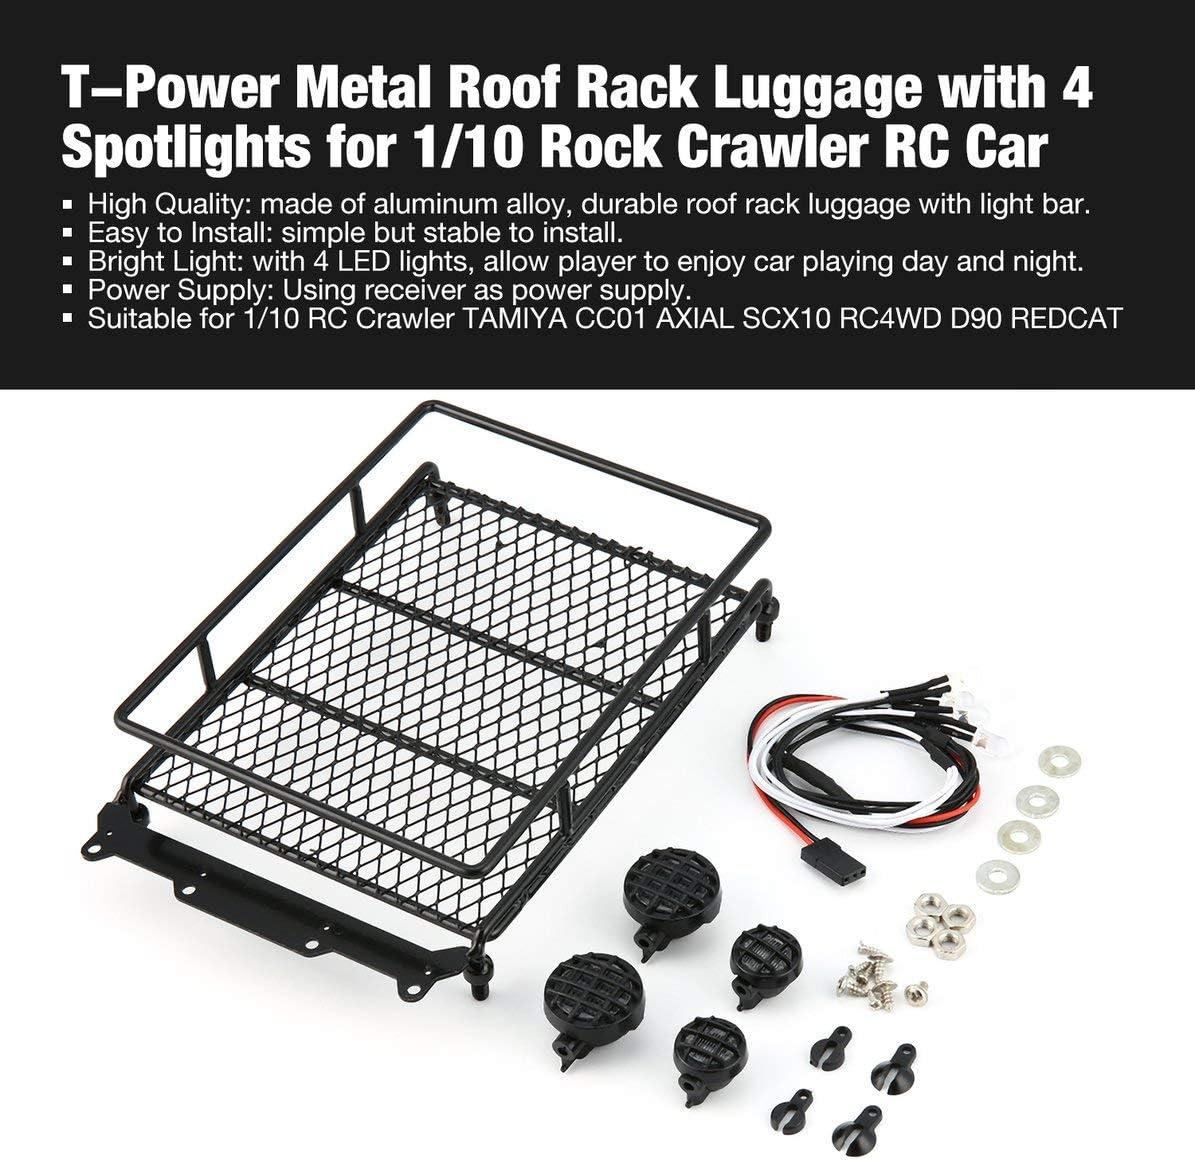 LAFEINA Aluminium Alloy Foldable Winch Anchor for 1//10 RC Rock Crawler Road Truck D90 SCX10 Tamiya